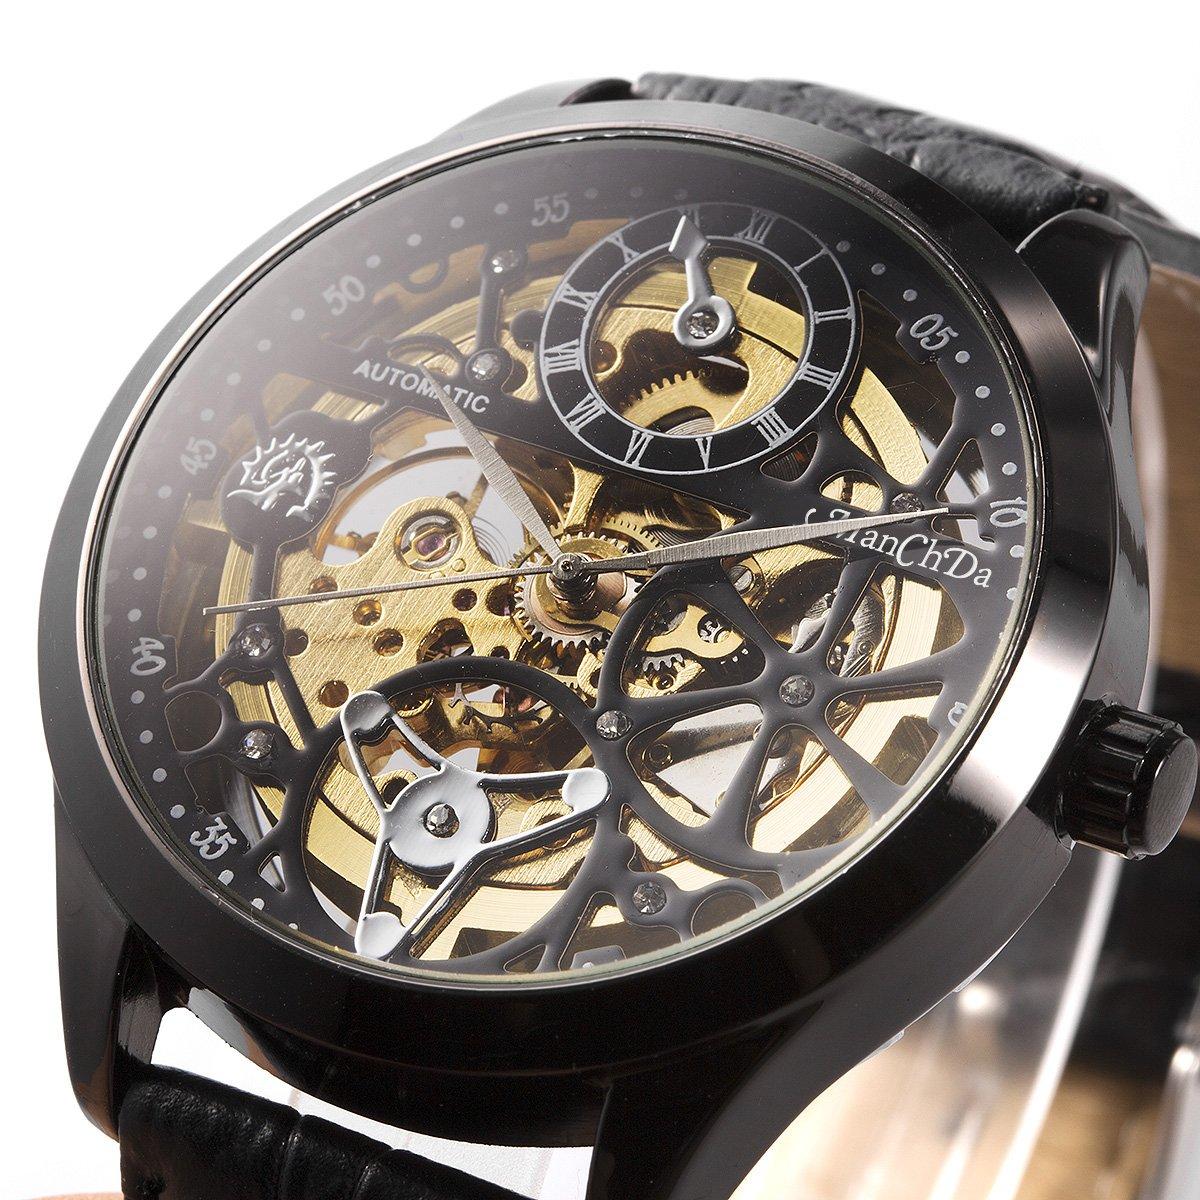 ManChDa Big Case 47MM XL Automatic Mechanical Crystal Black Leather Wrist Watch + Gift Box by ManChDa (Image #4)